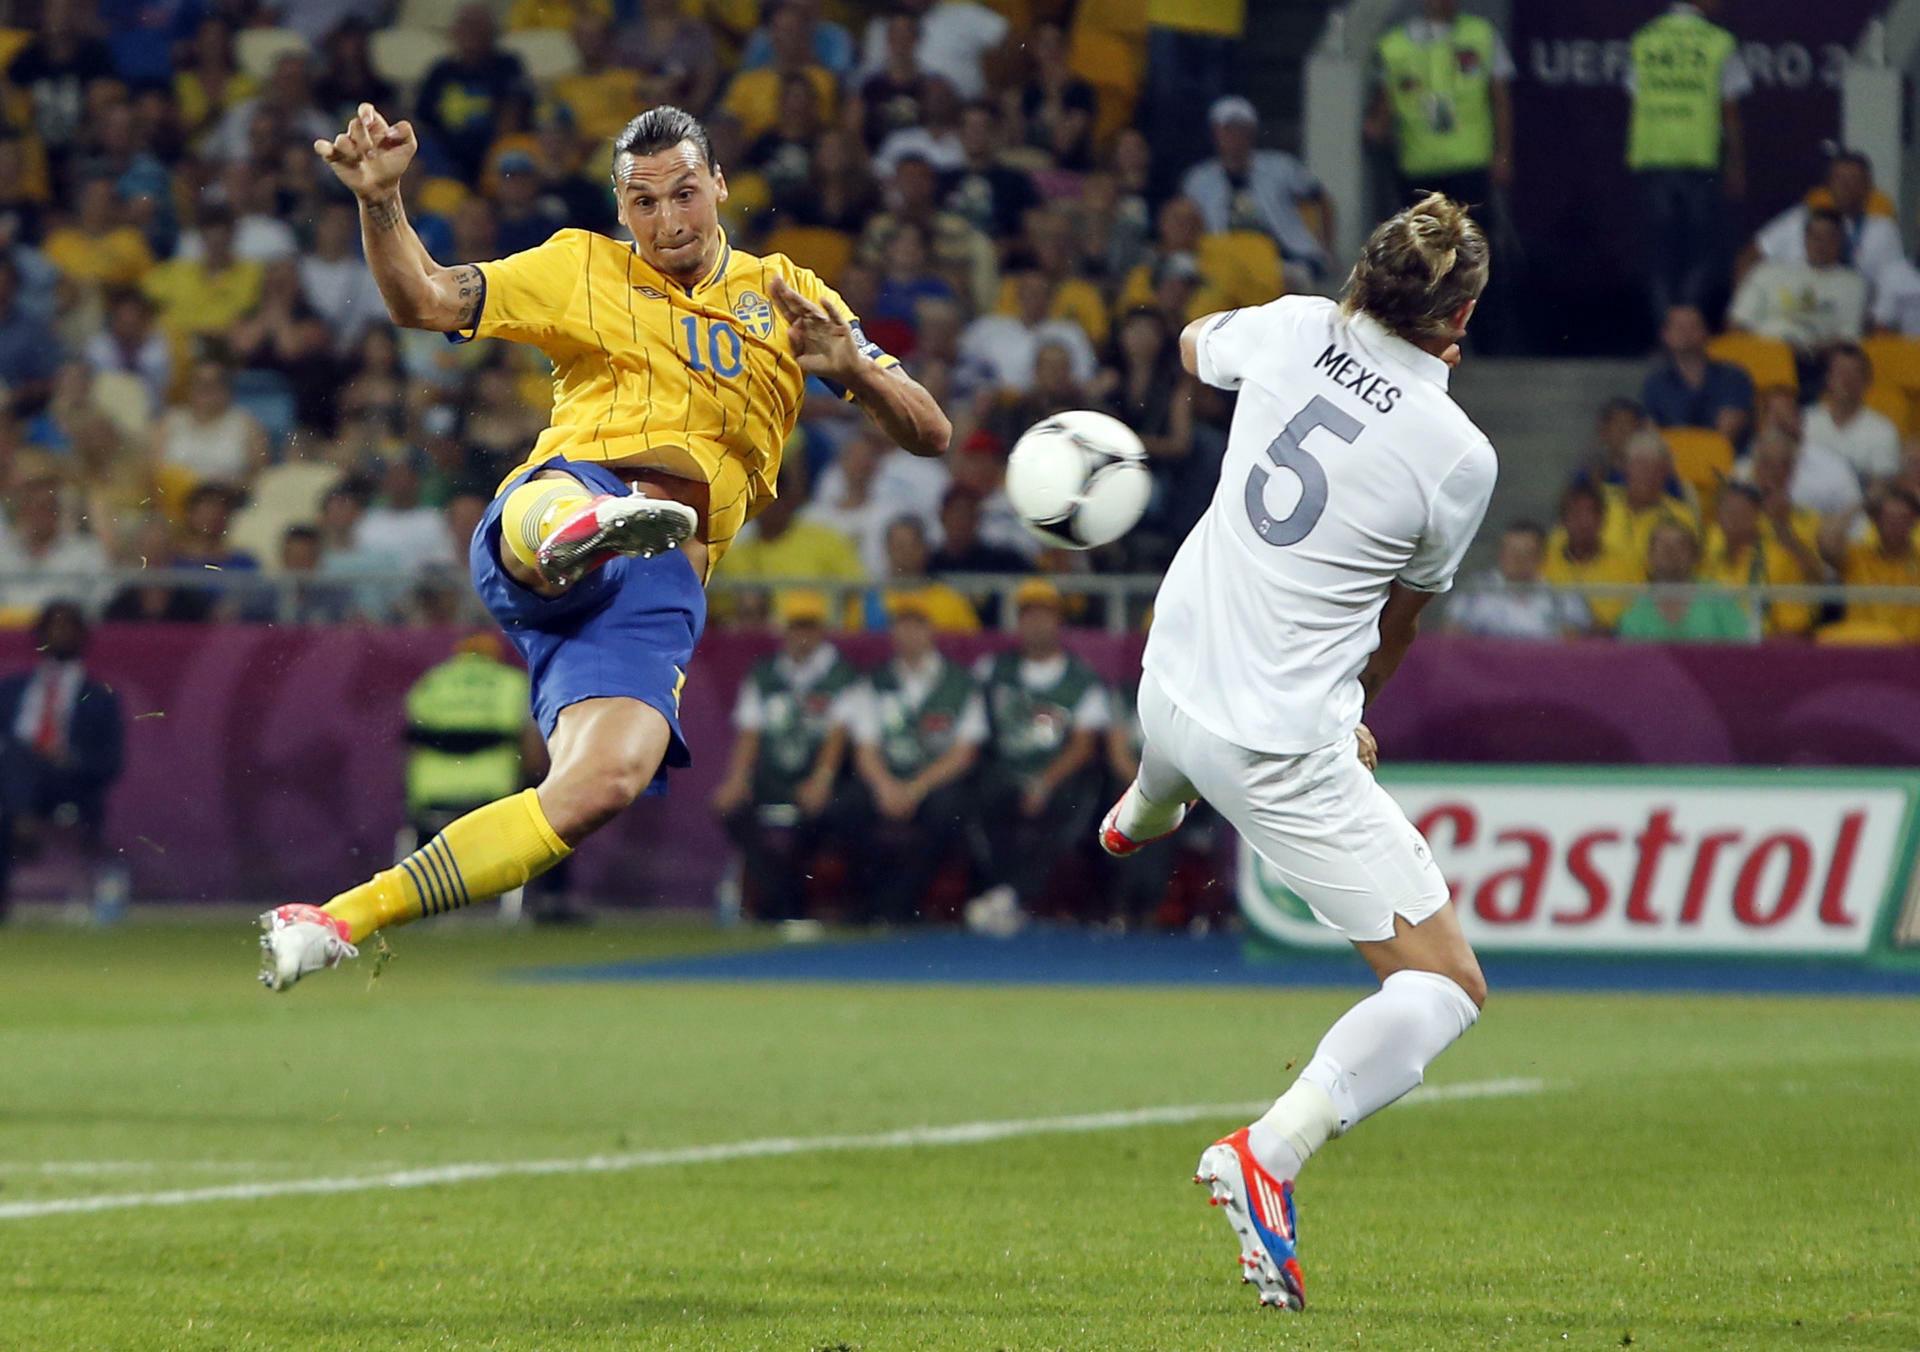 Zlatan Ibrahimovic Taekwondo Fallrückzieher Gegen England